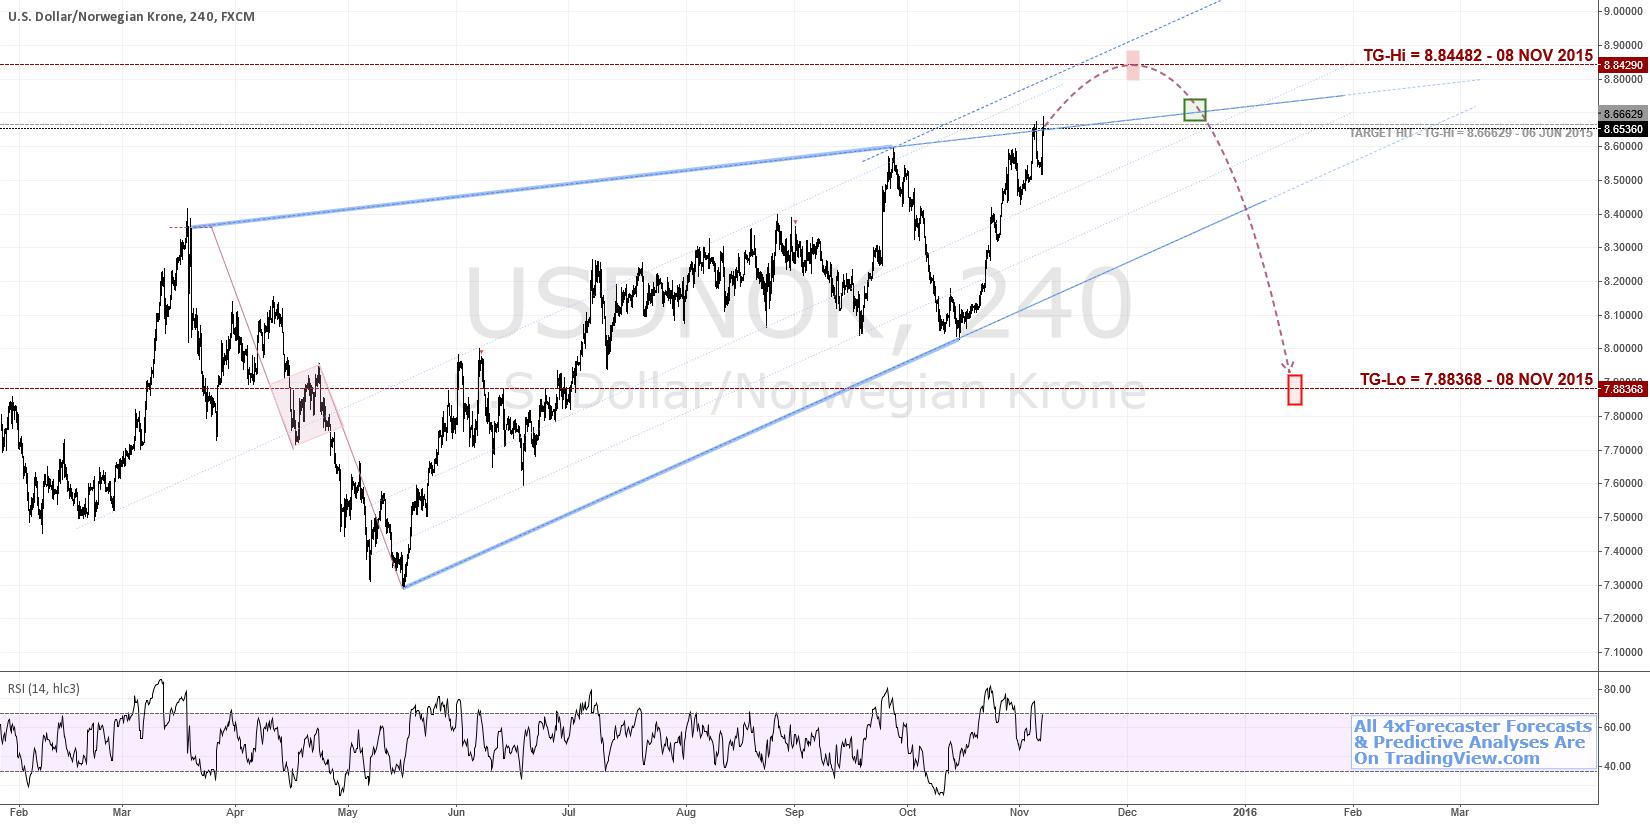 $USD v $NOK - Geo Eyes Imminent Bullish, Then Bearish Targets